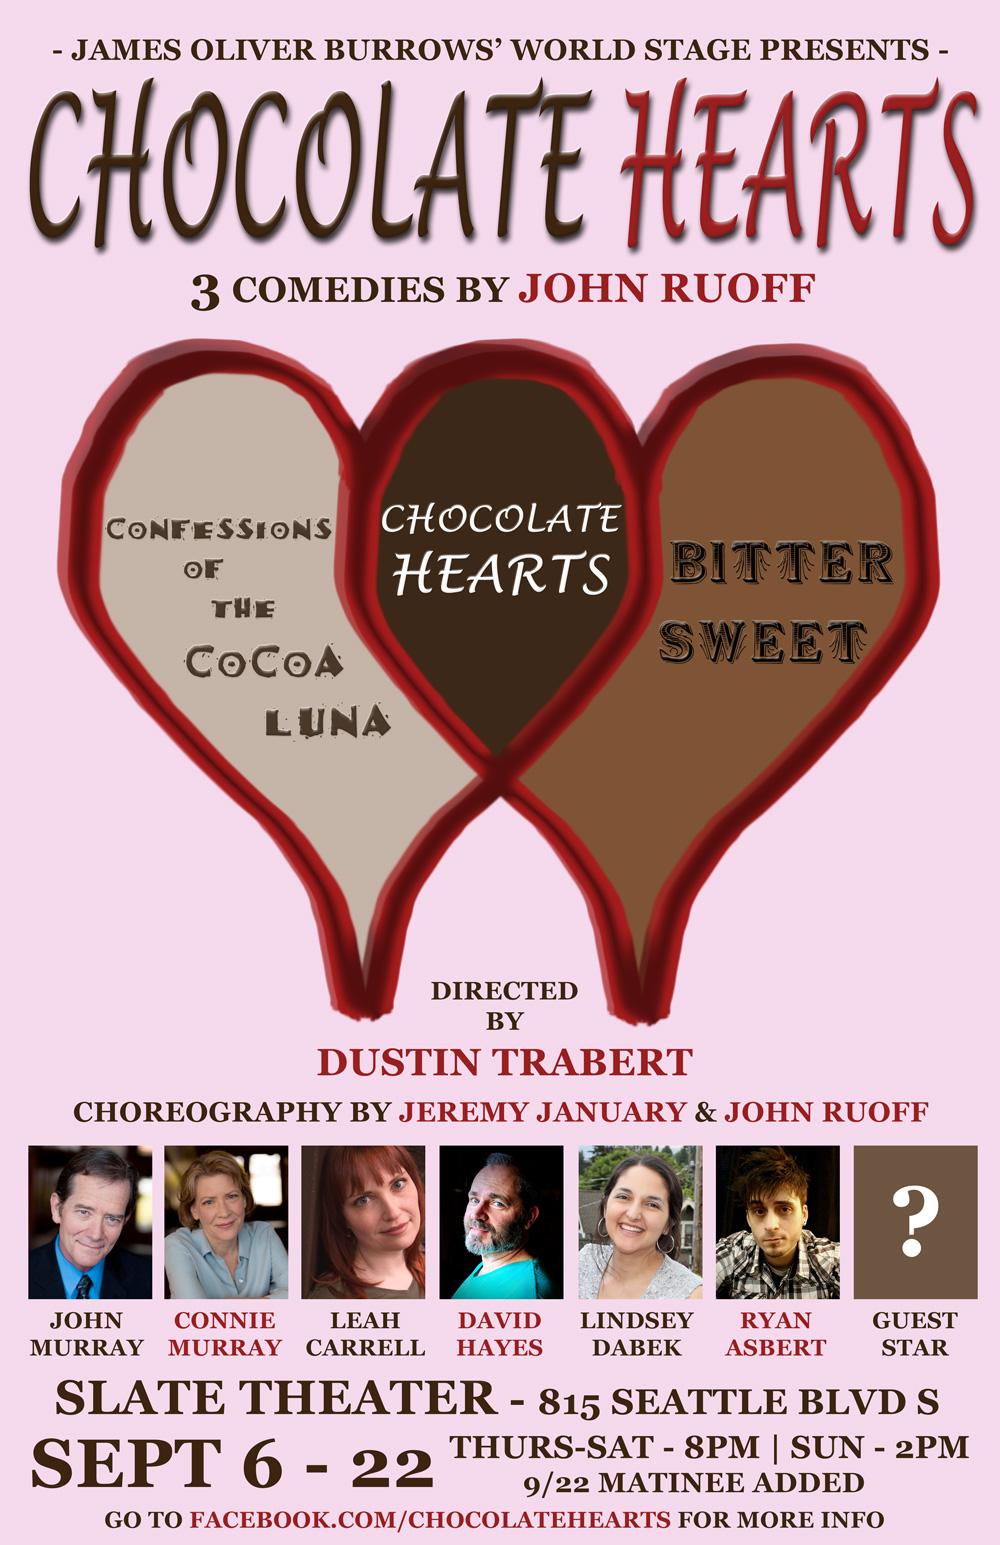 chocolatehearts04.jpg FINAL -2-1-1.jpg